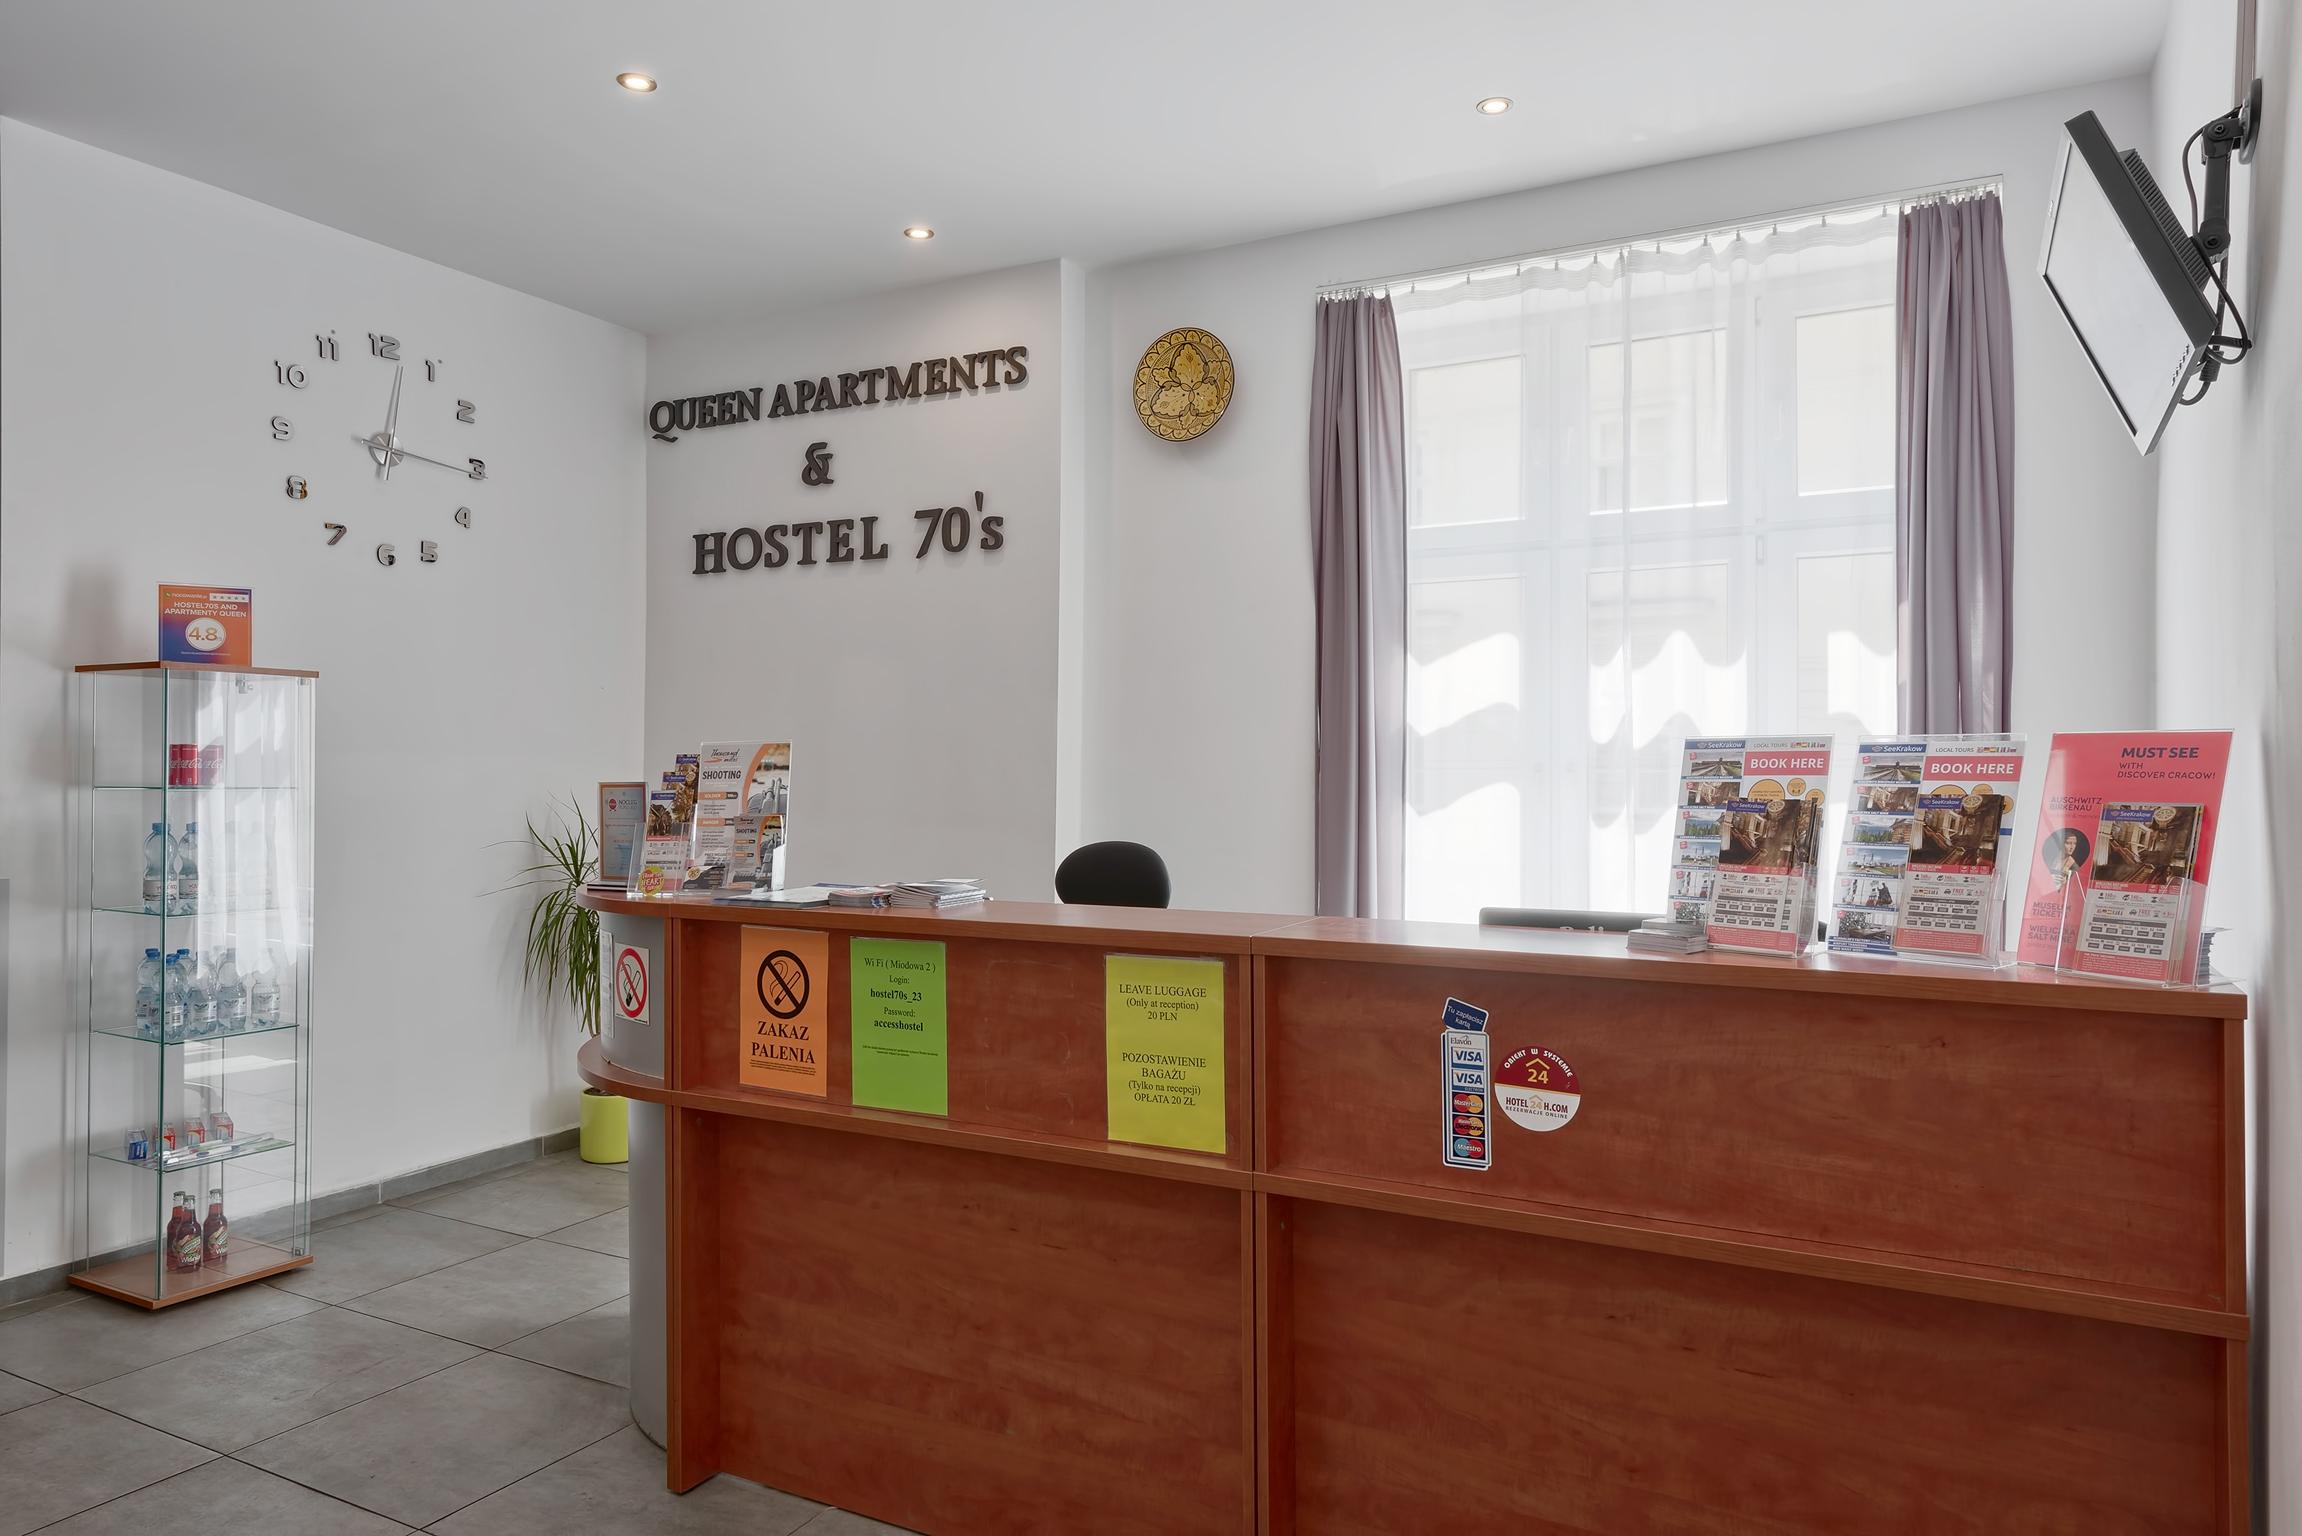 Hostel 70s